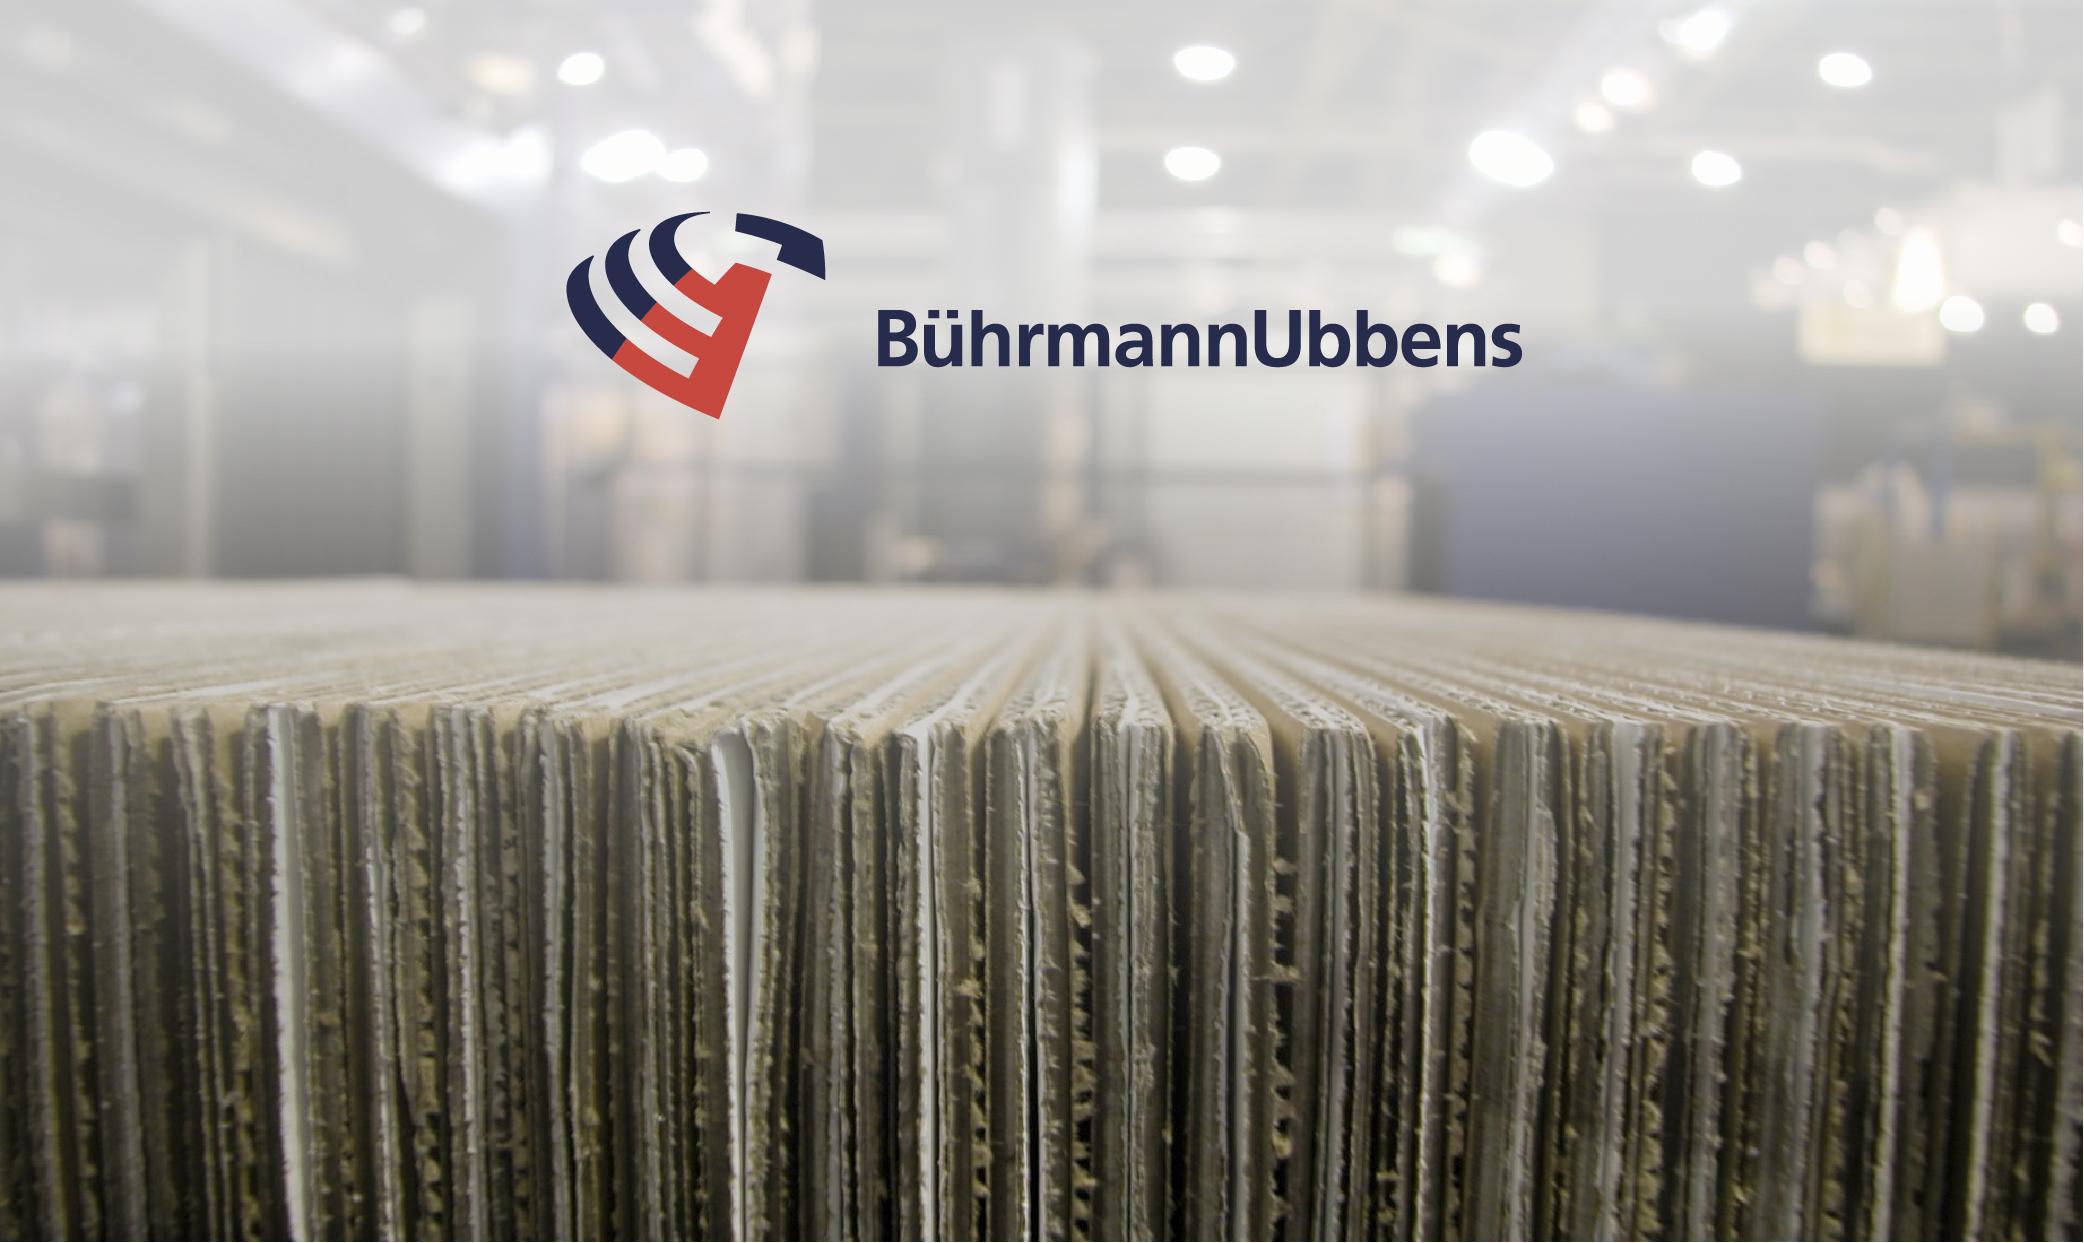 BührmannUbbens